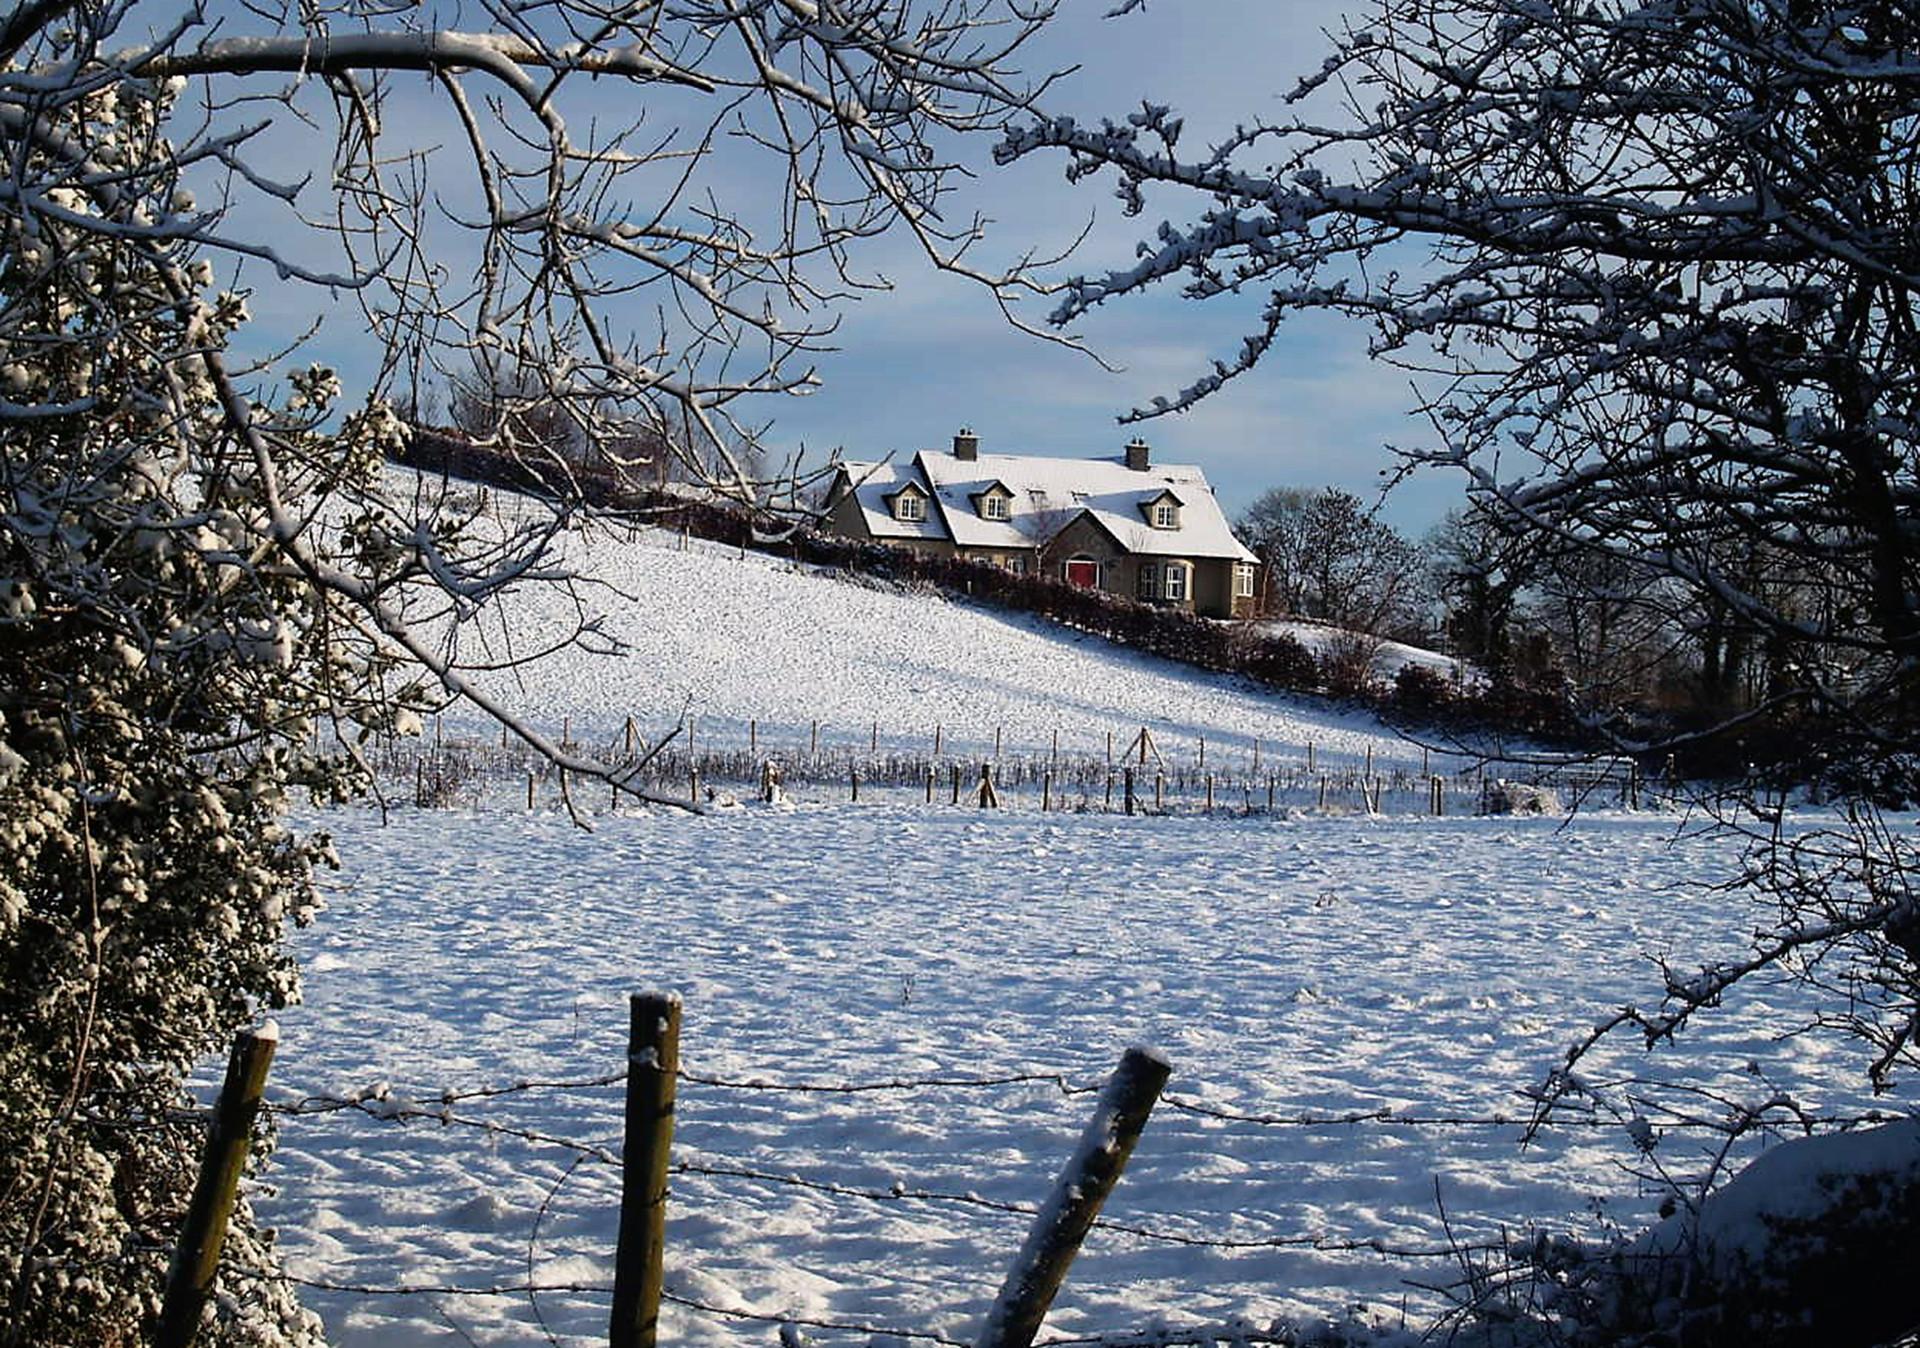 PDI - Winter Scene by John Gervin (8 marks)